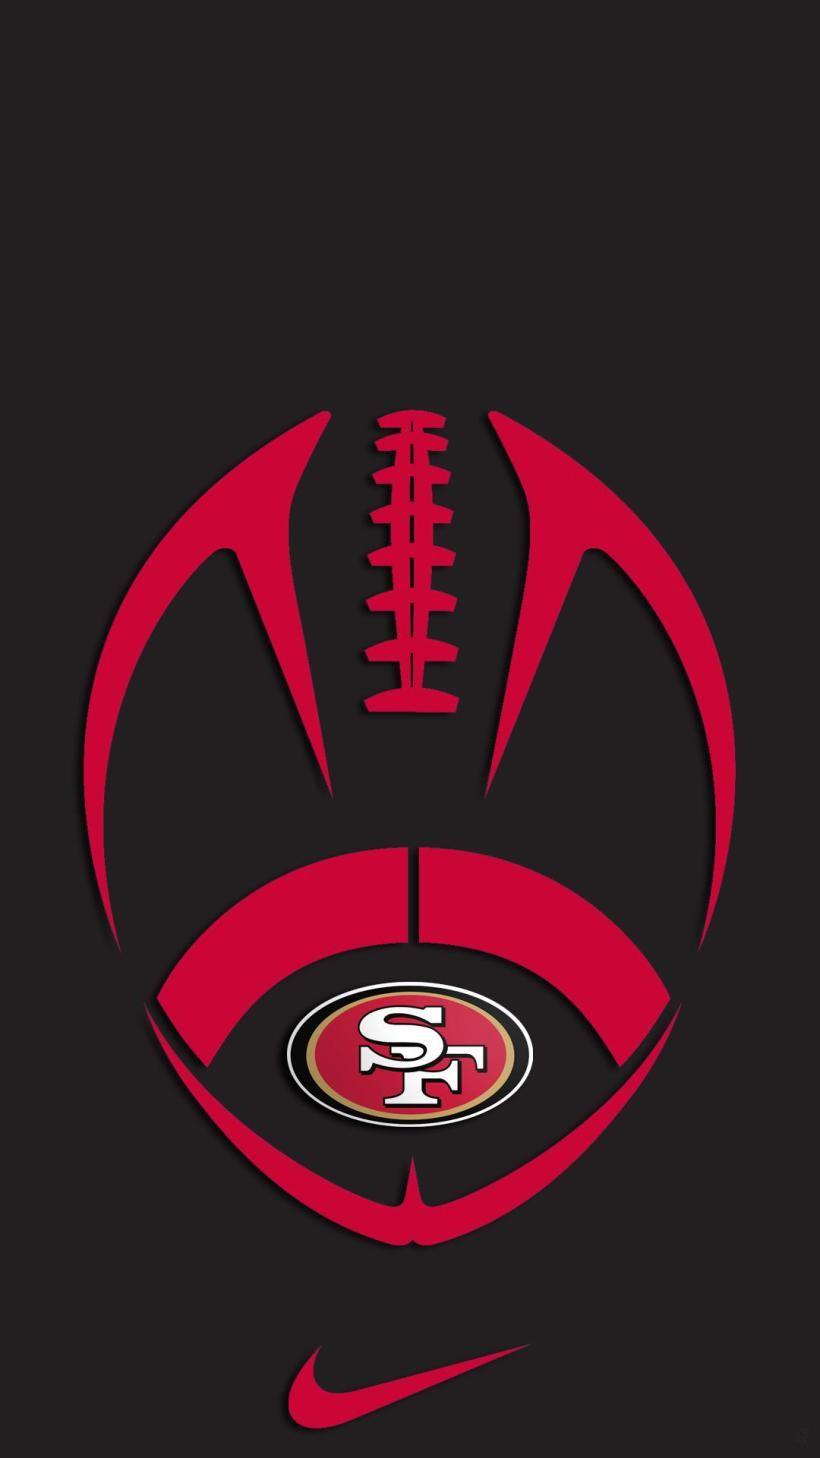 49ers Iphone Wallpaper Jpg 820 1458 San Francisco 49ers Logo San Francisco 49ers 49ers